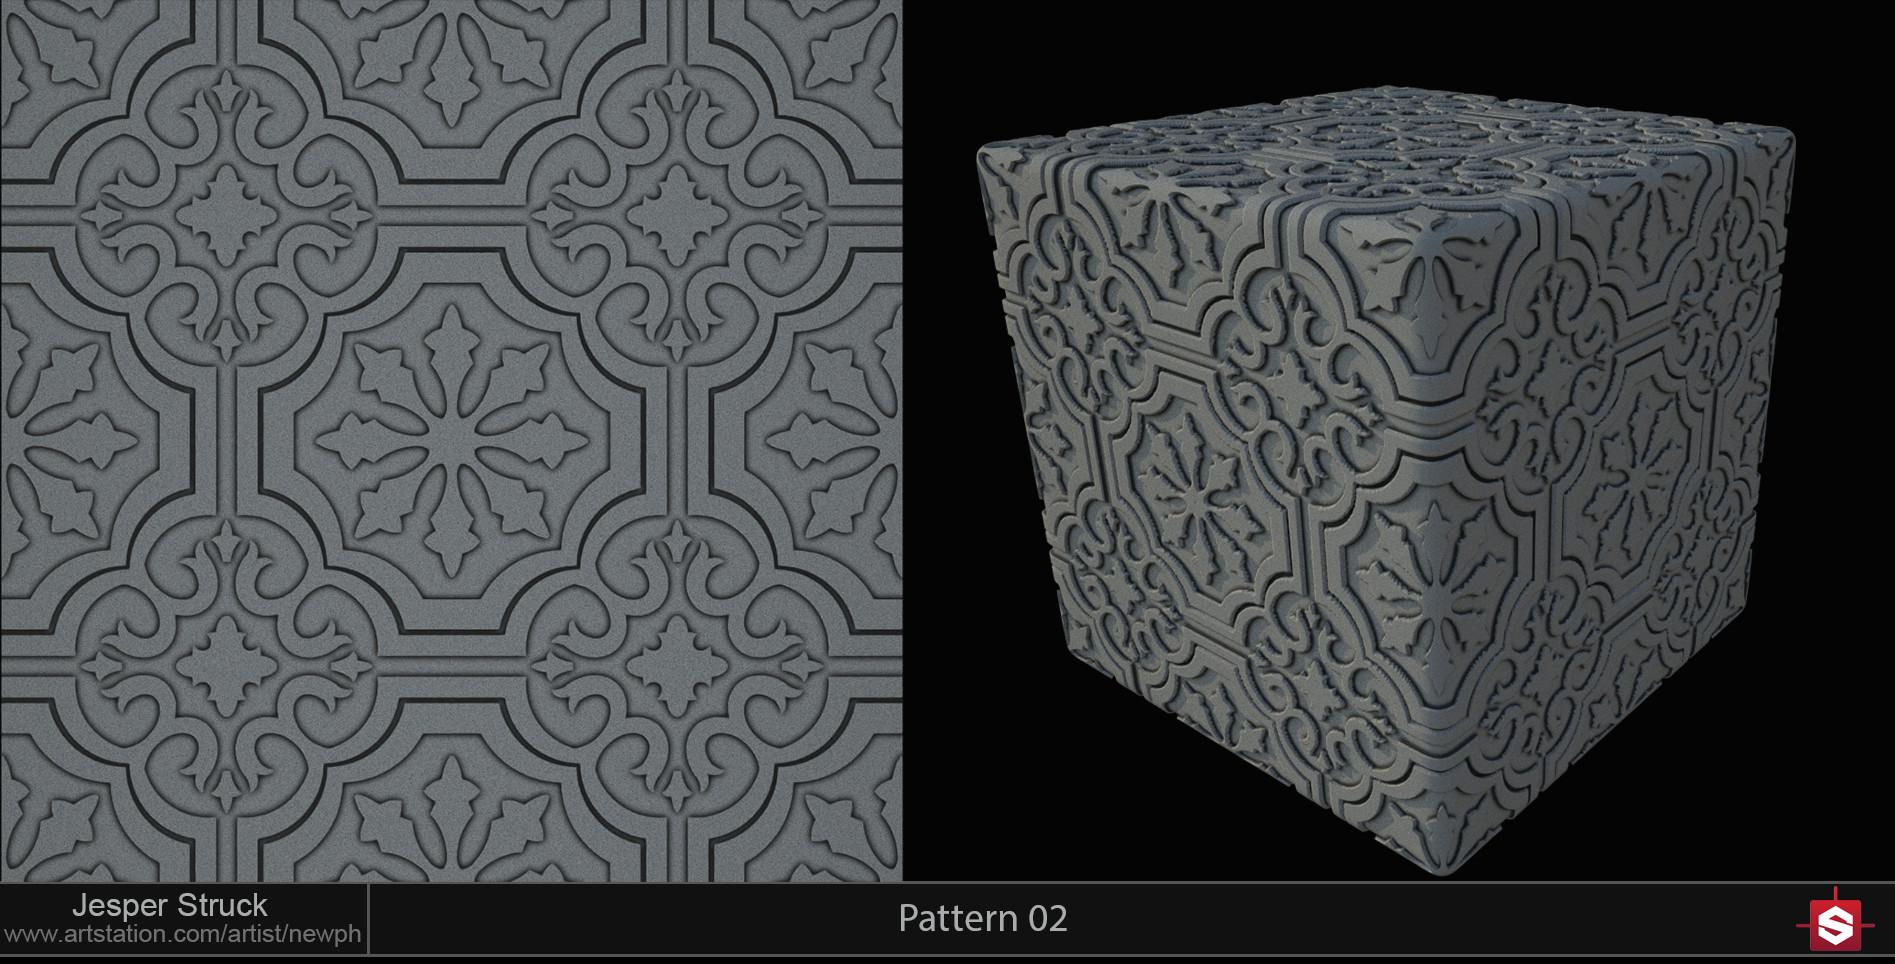 Jesper struck portfolio sd pattern 02